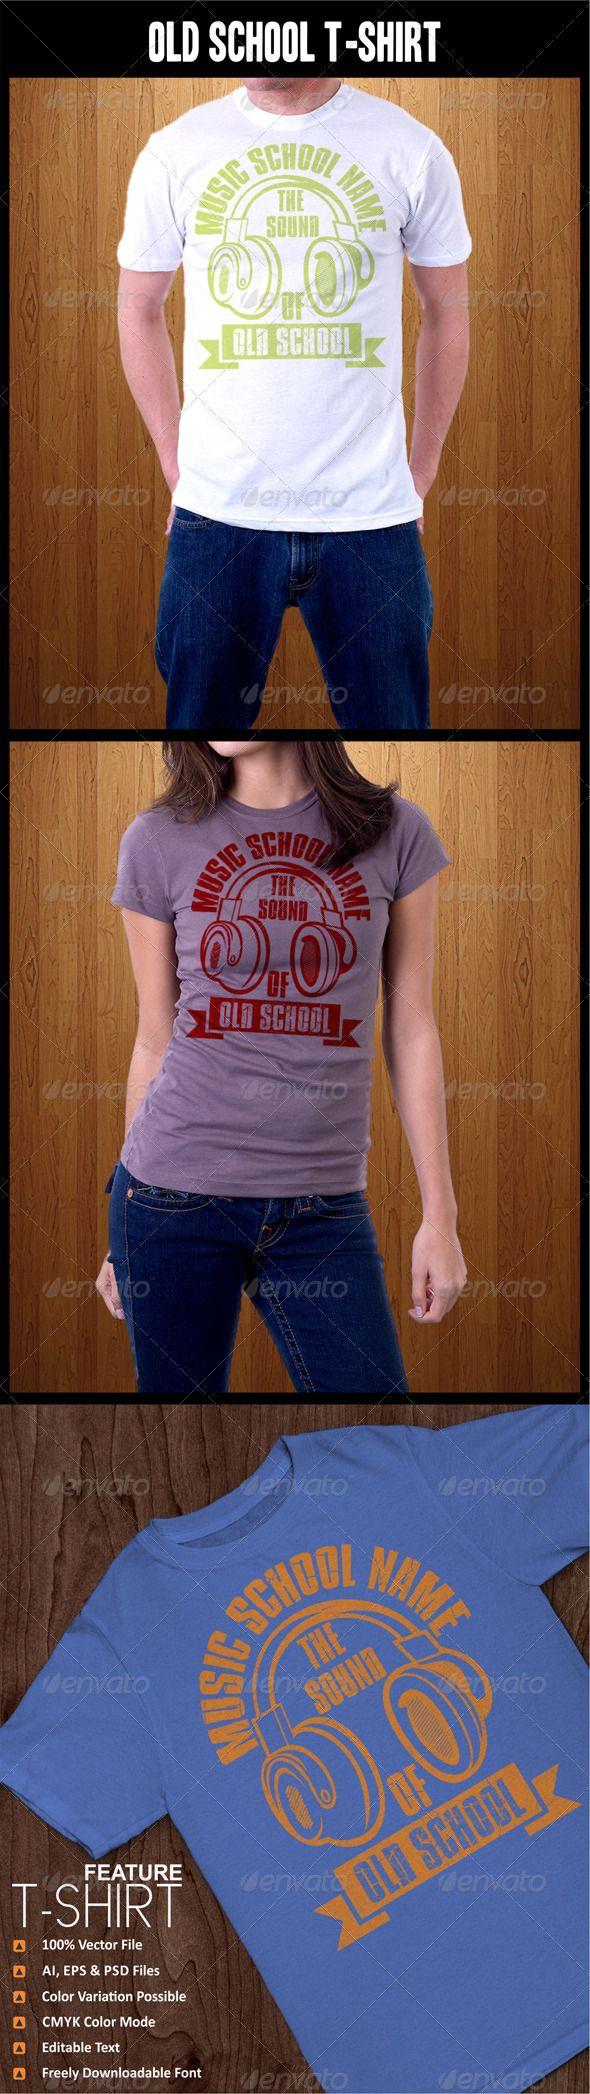 Old #School #T-Shirt - Grunge #Designs Download here: https://graphicriver.net/item/old-school-tshirt/4448131?ref=alena994